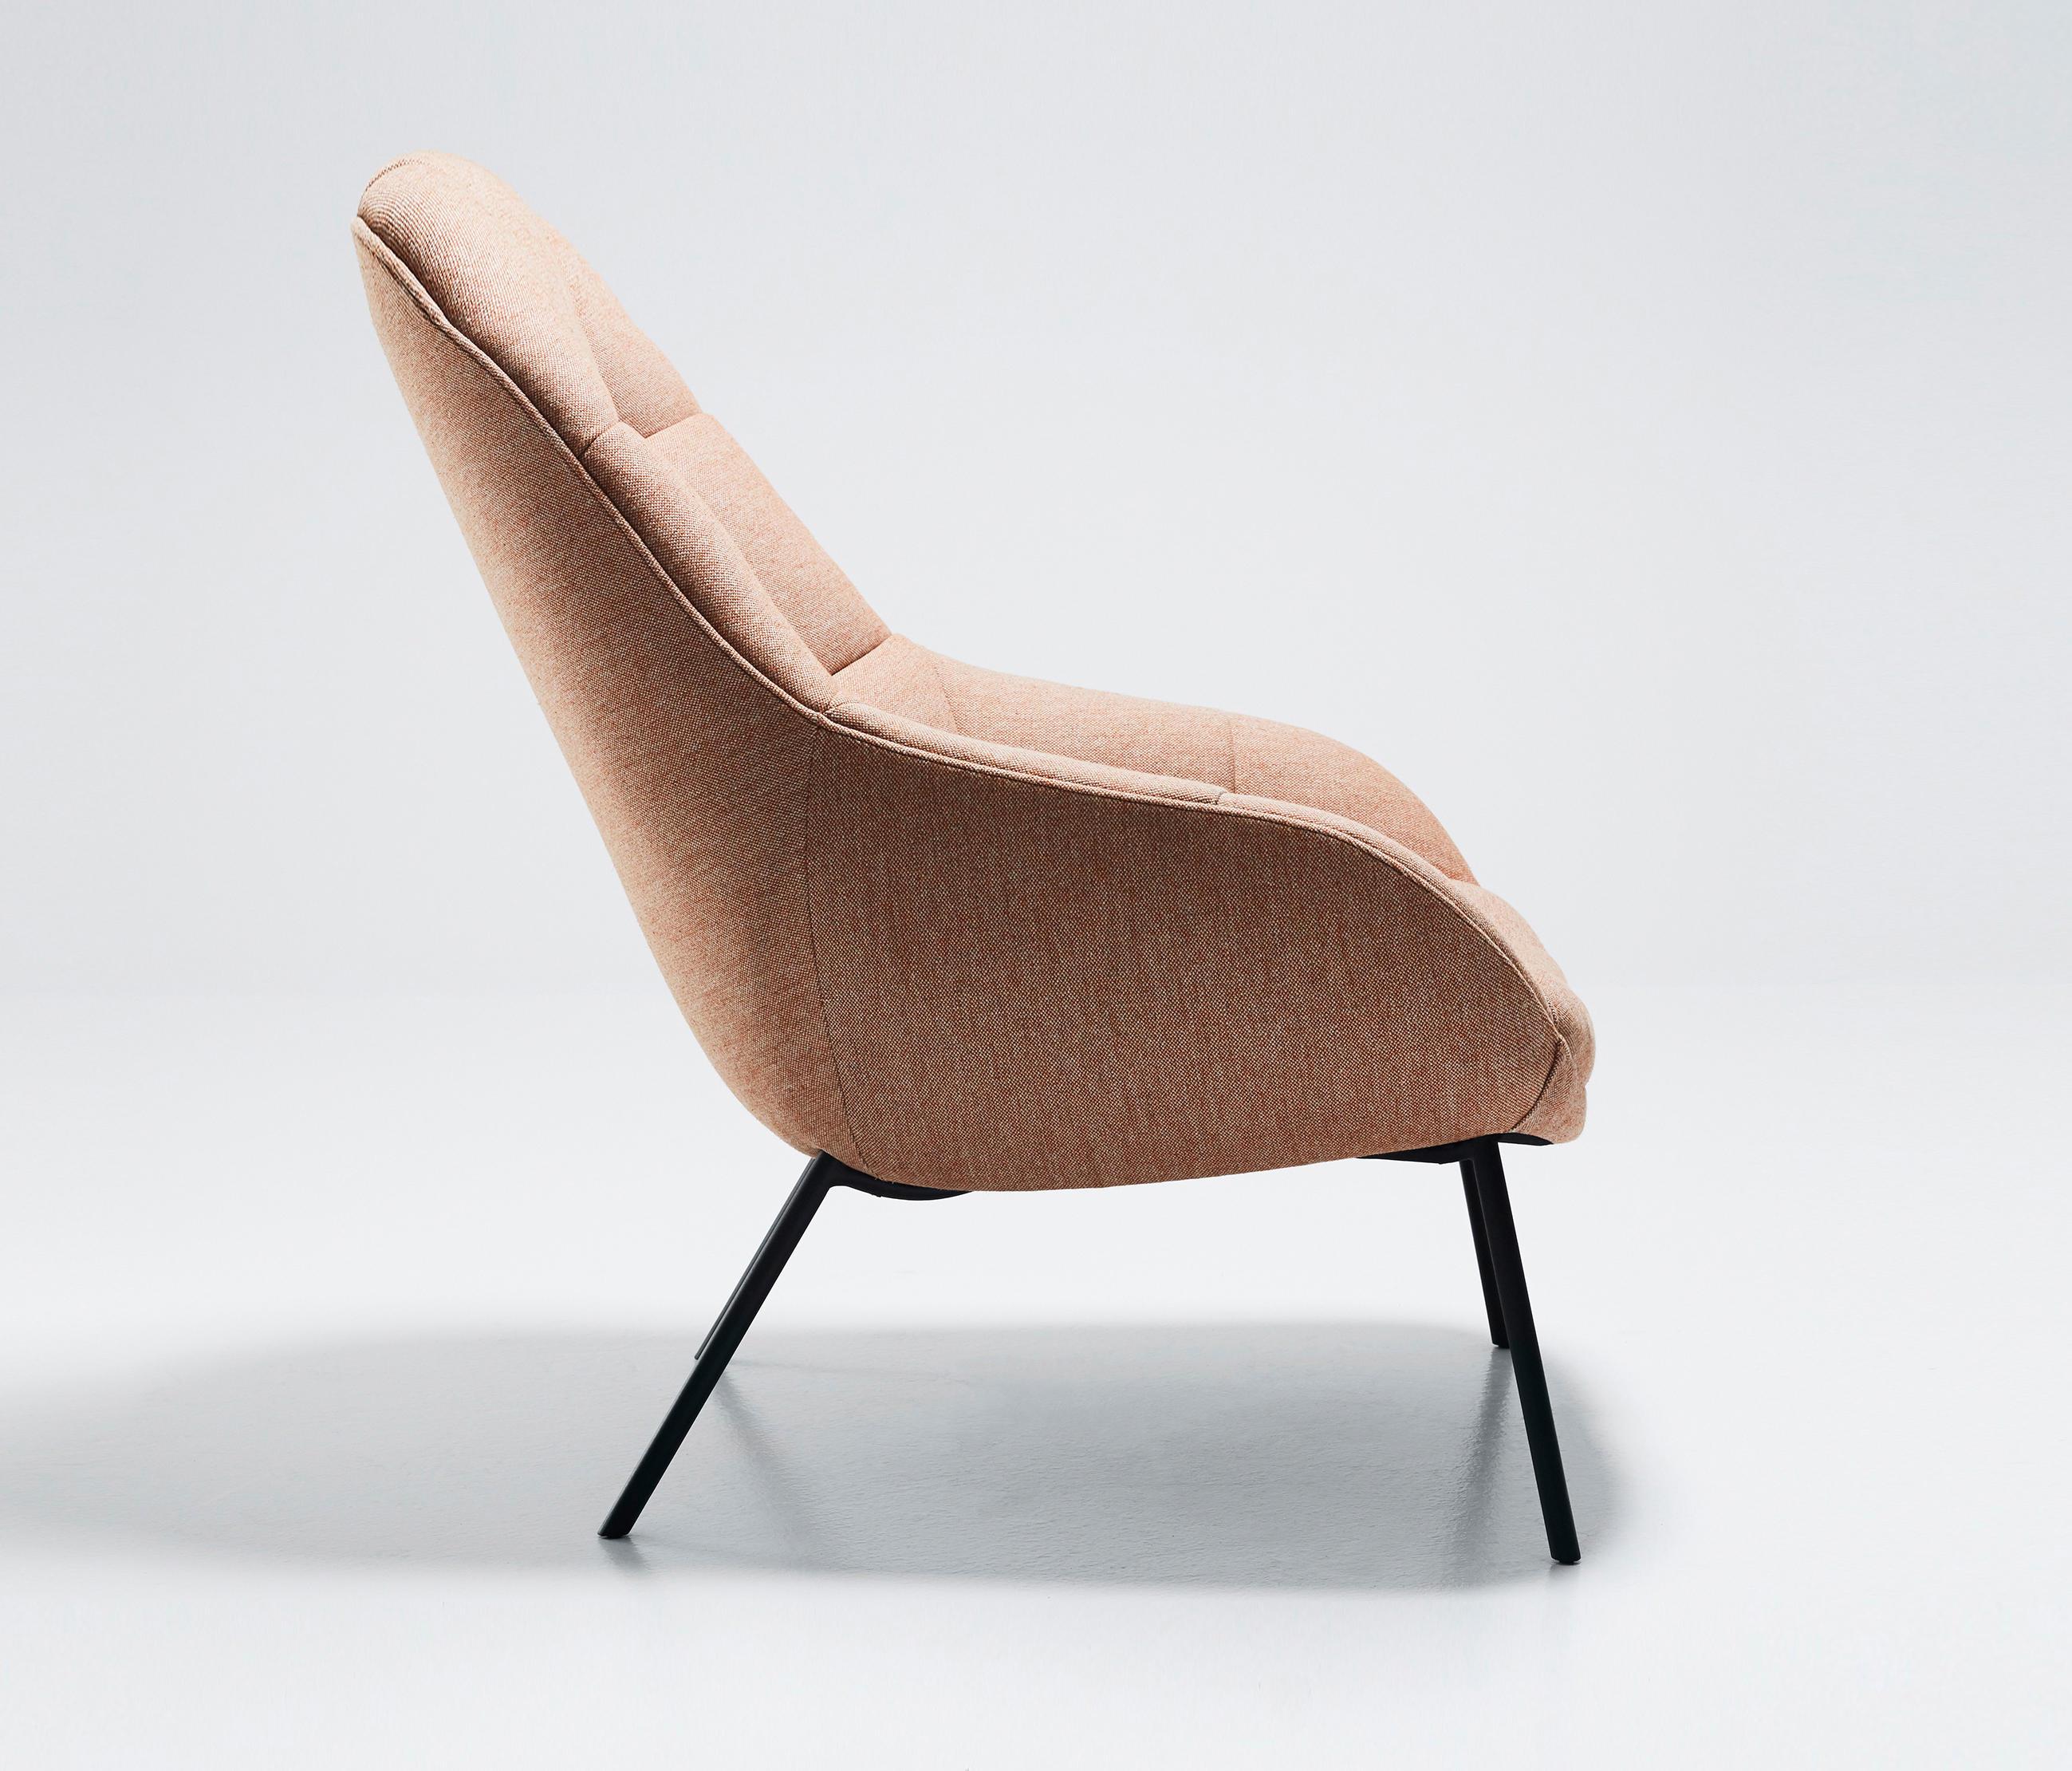 mango armchairs from won design architonic